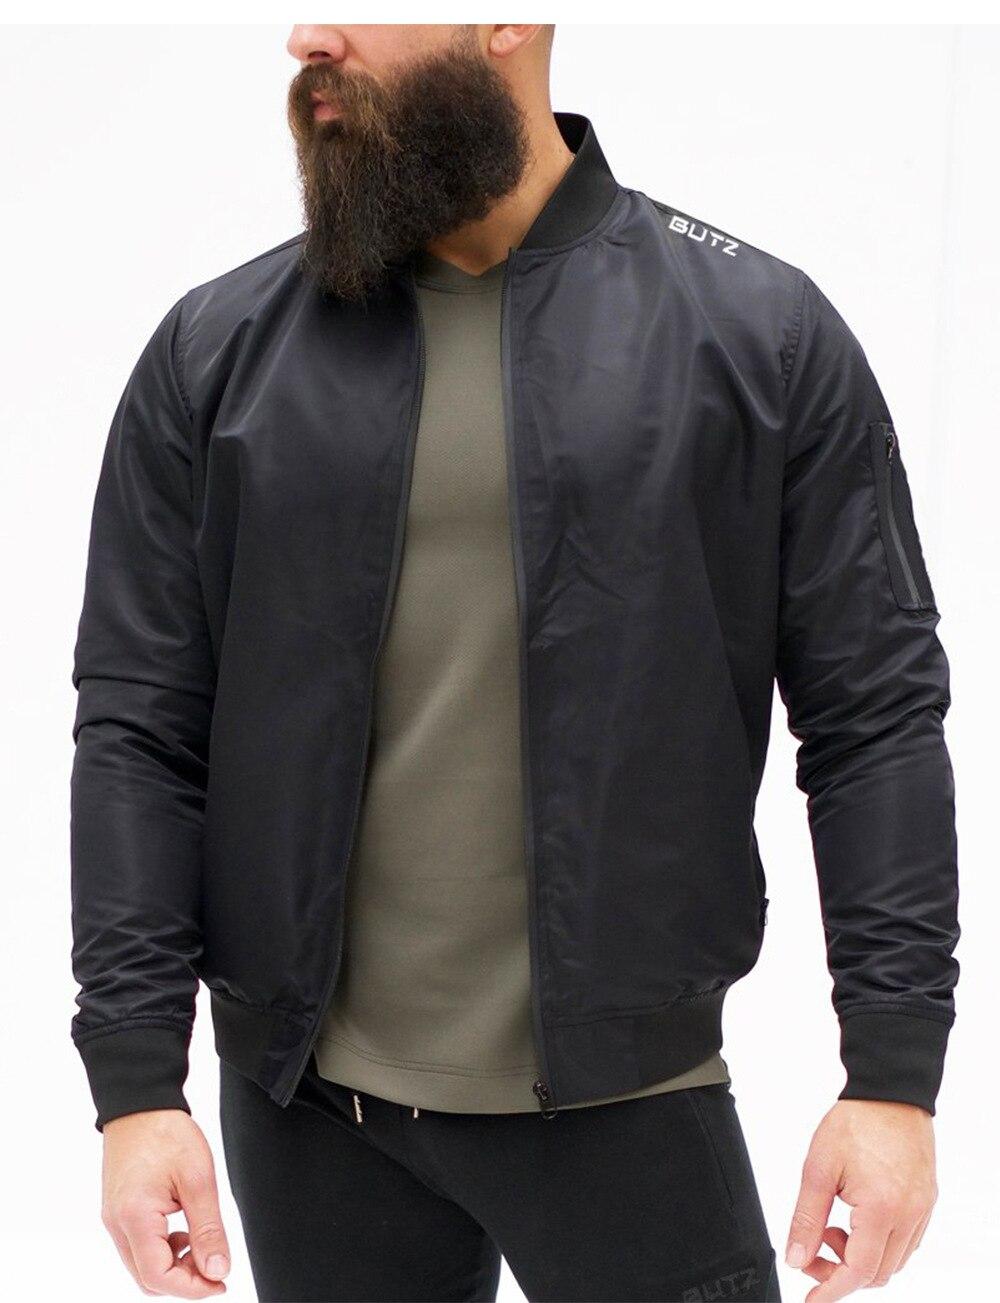 stylish sports jacket leaning - HD1000×1303